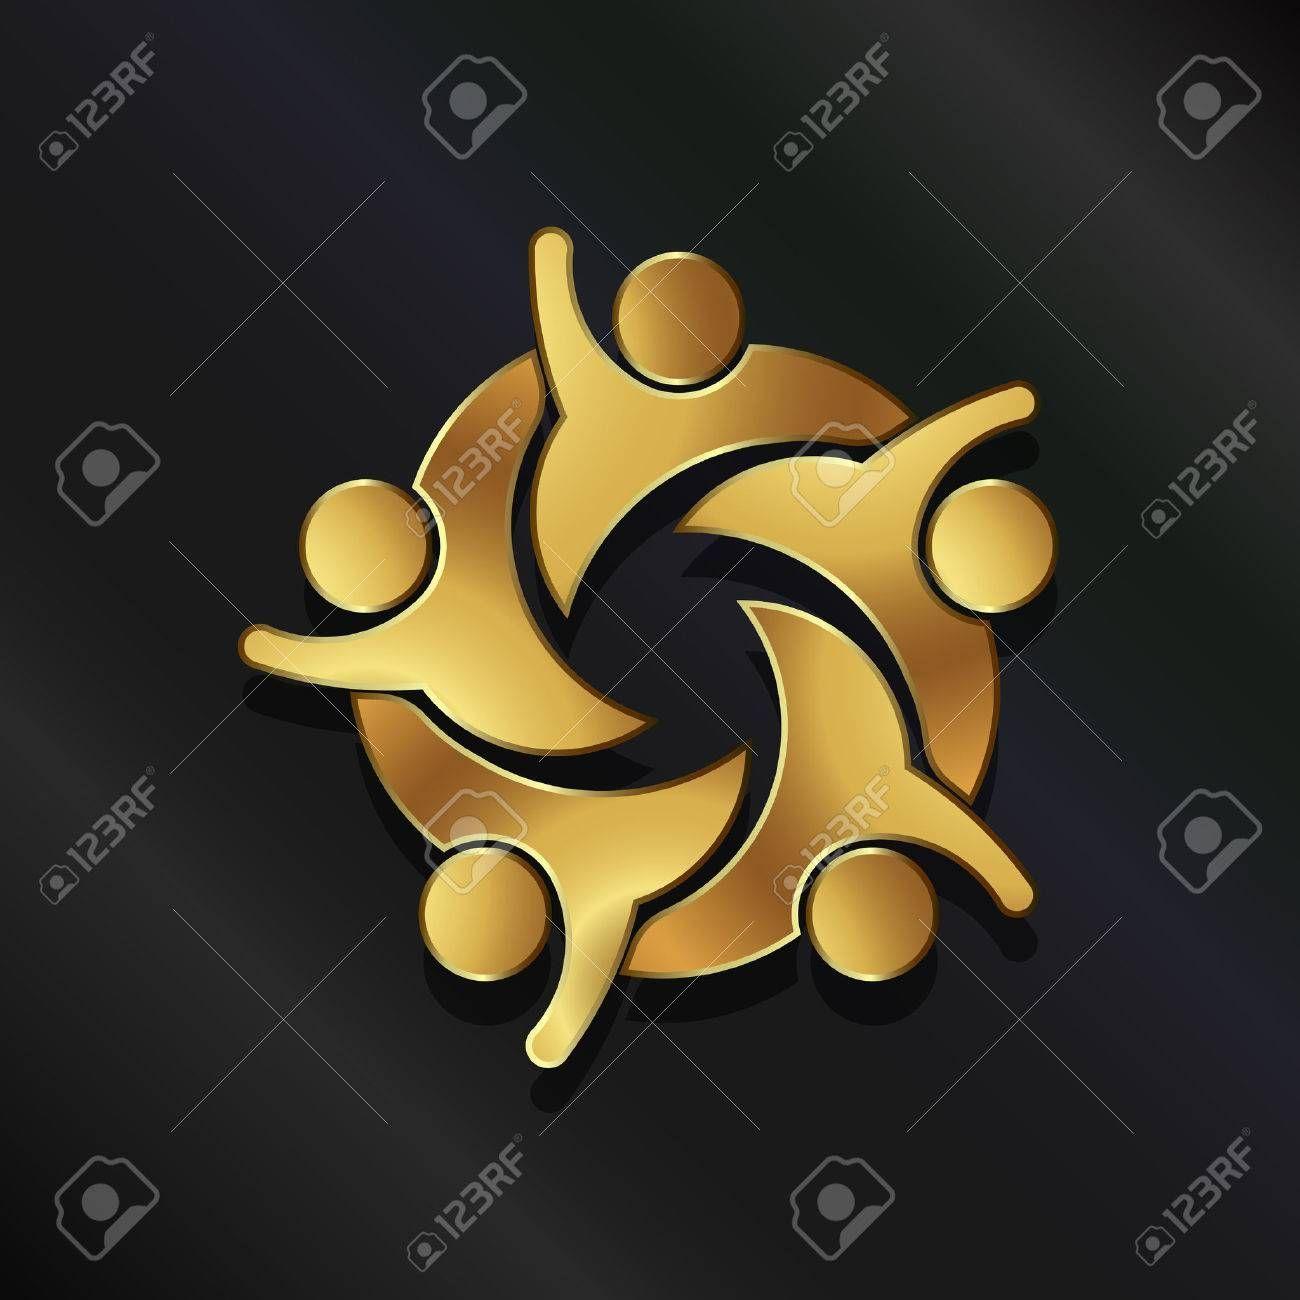 Stock Vector Art logo, Teamwork, Group of five